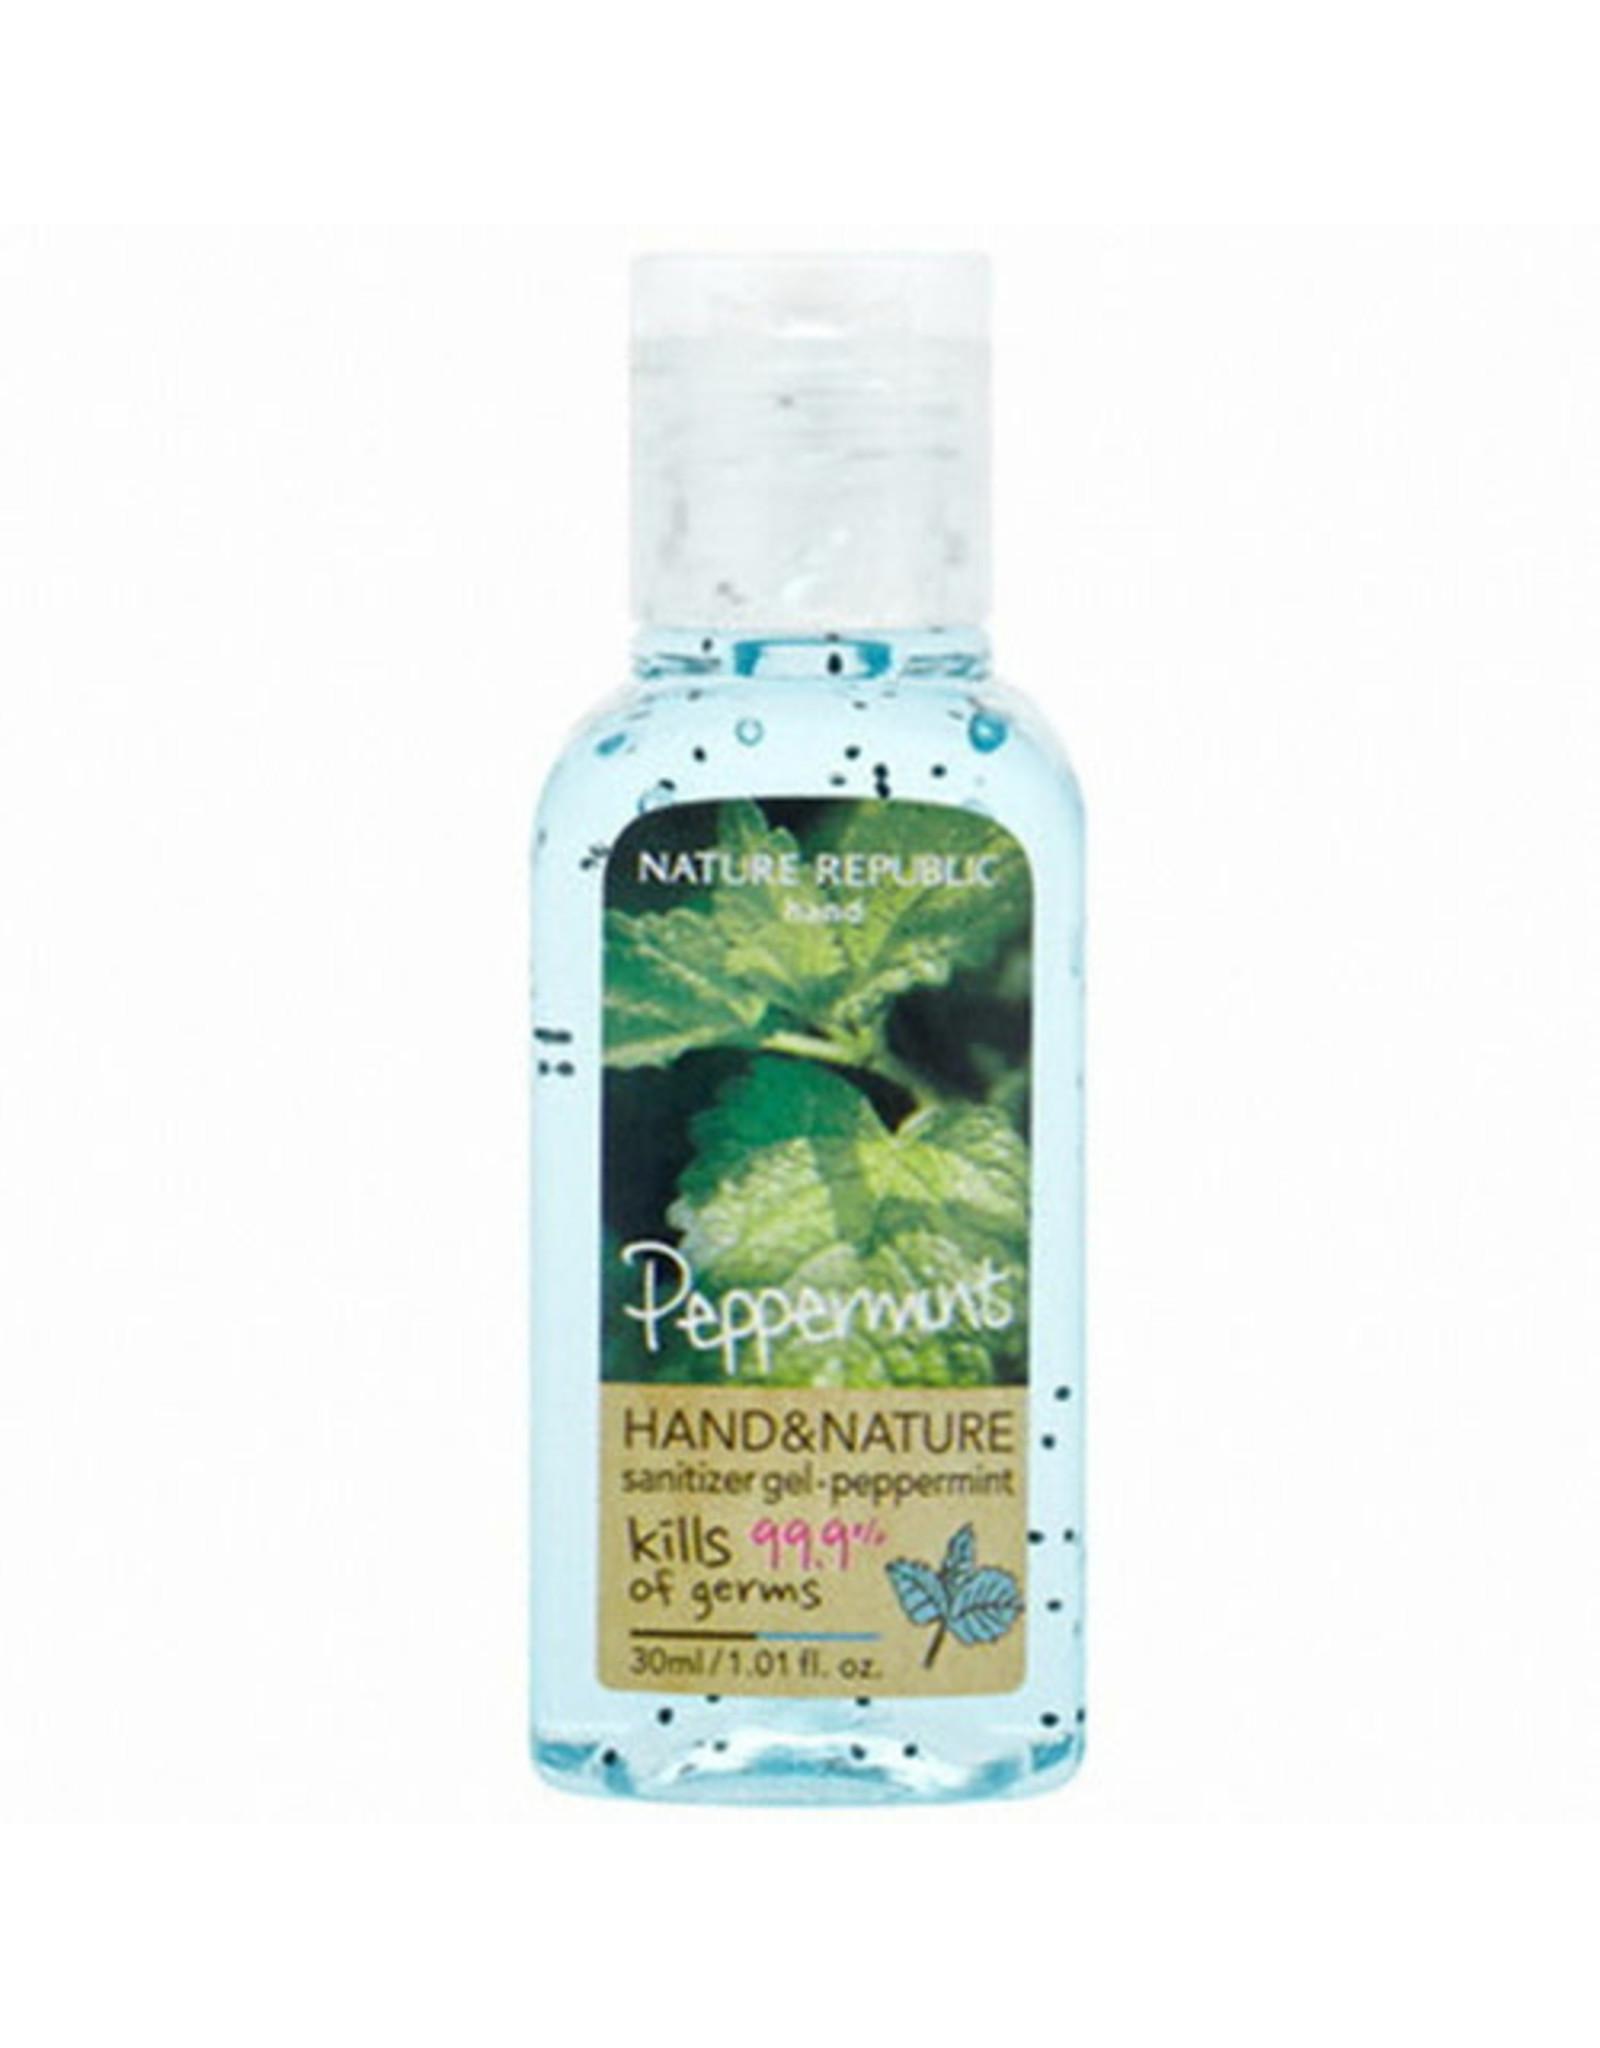 Hand & Nature Sanitizer Gel-Peppermint